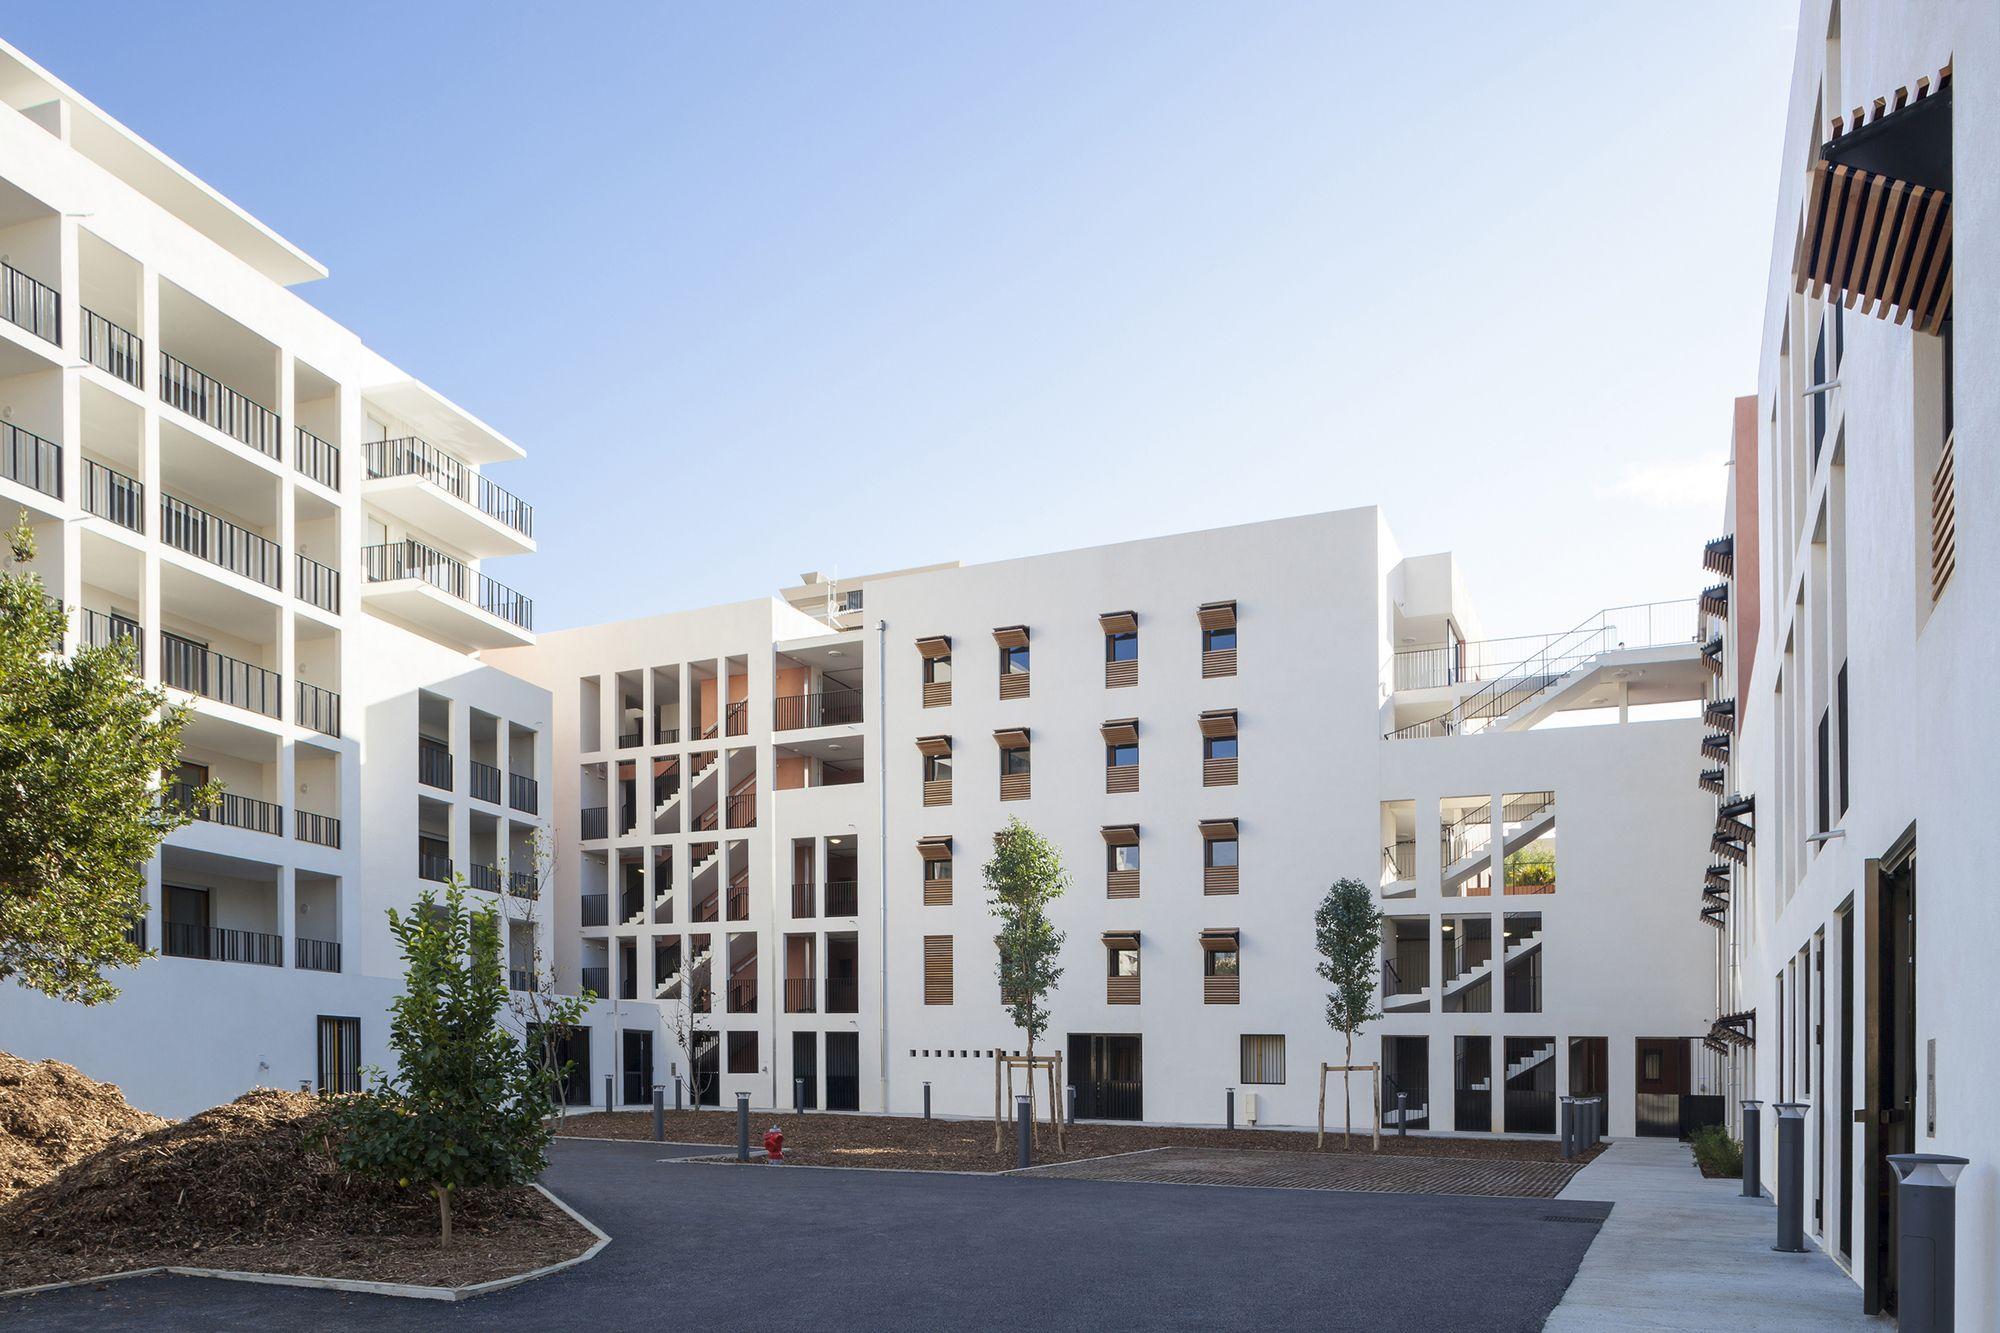 58 Social Housing in Antibes / Atelier PIROLLET architectes